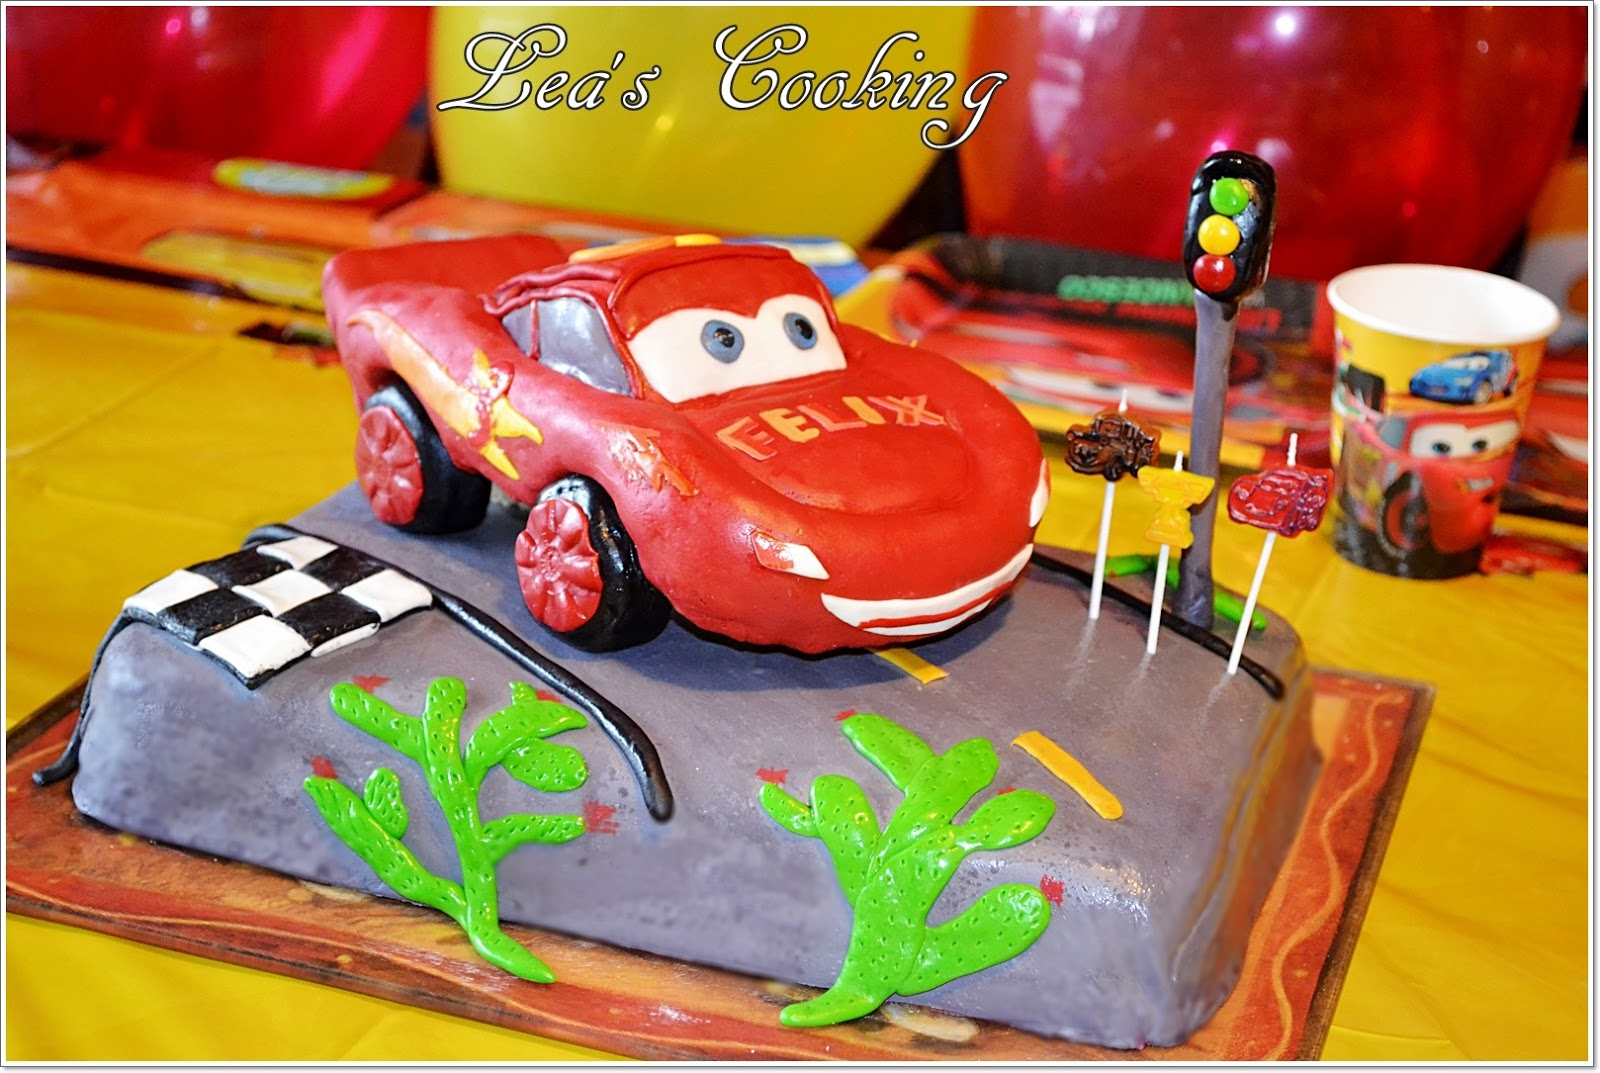 Leas cooking cars lightning mcqueen cake topper tutorial cars lightning mcqueen cake topper tutorial baditri Choice Image